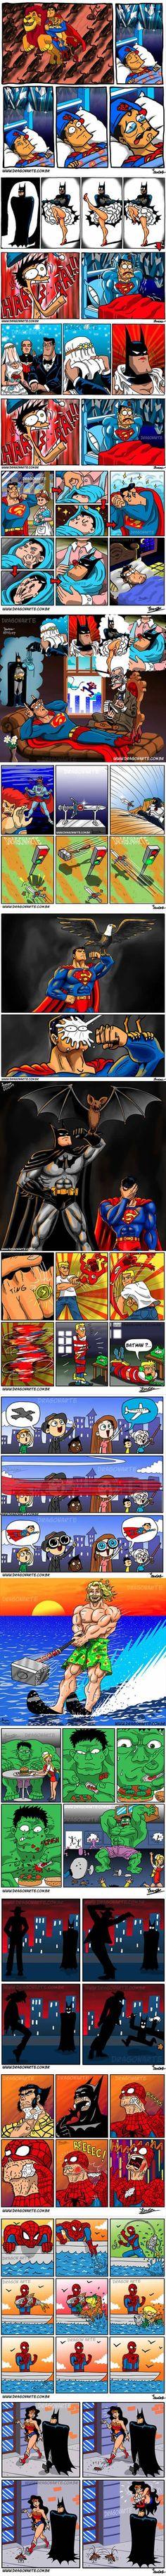 The Funniest Superhero Comics Collection (Part 2):